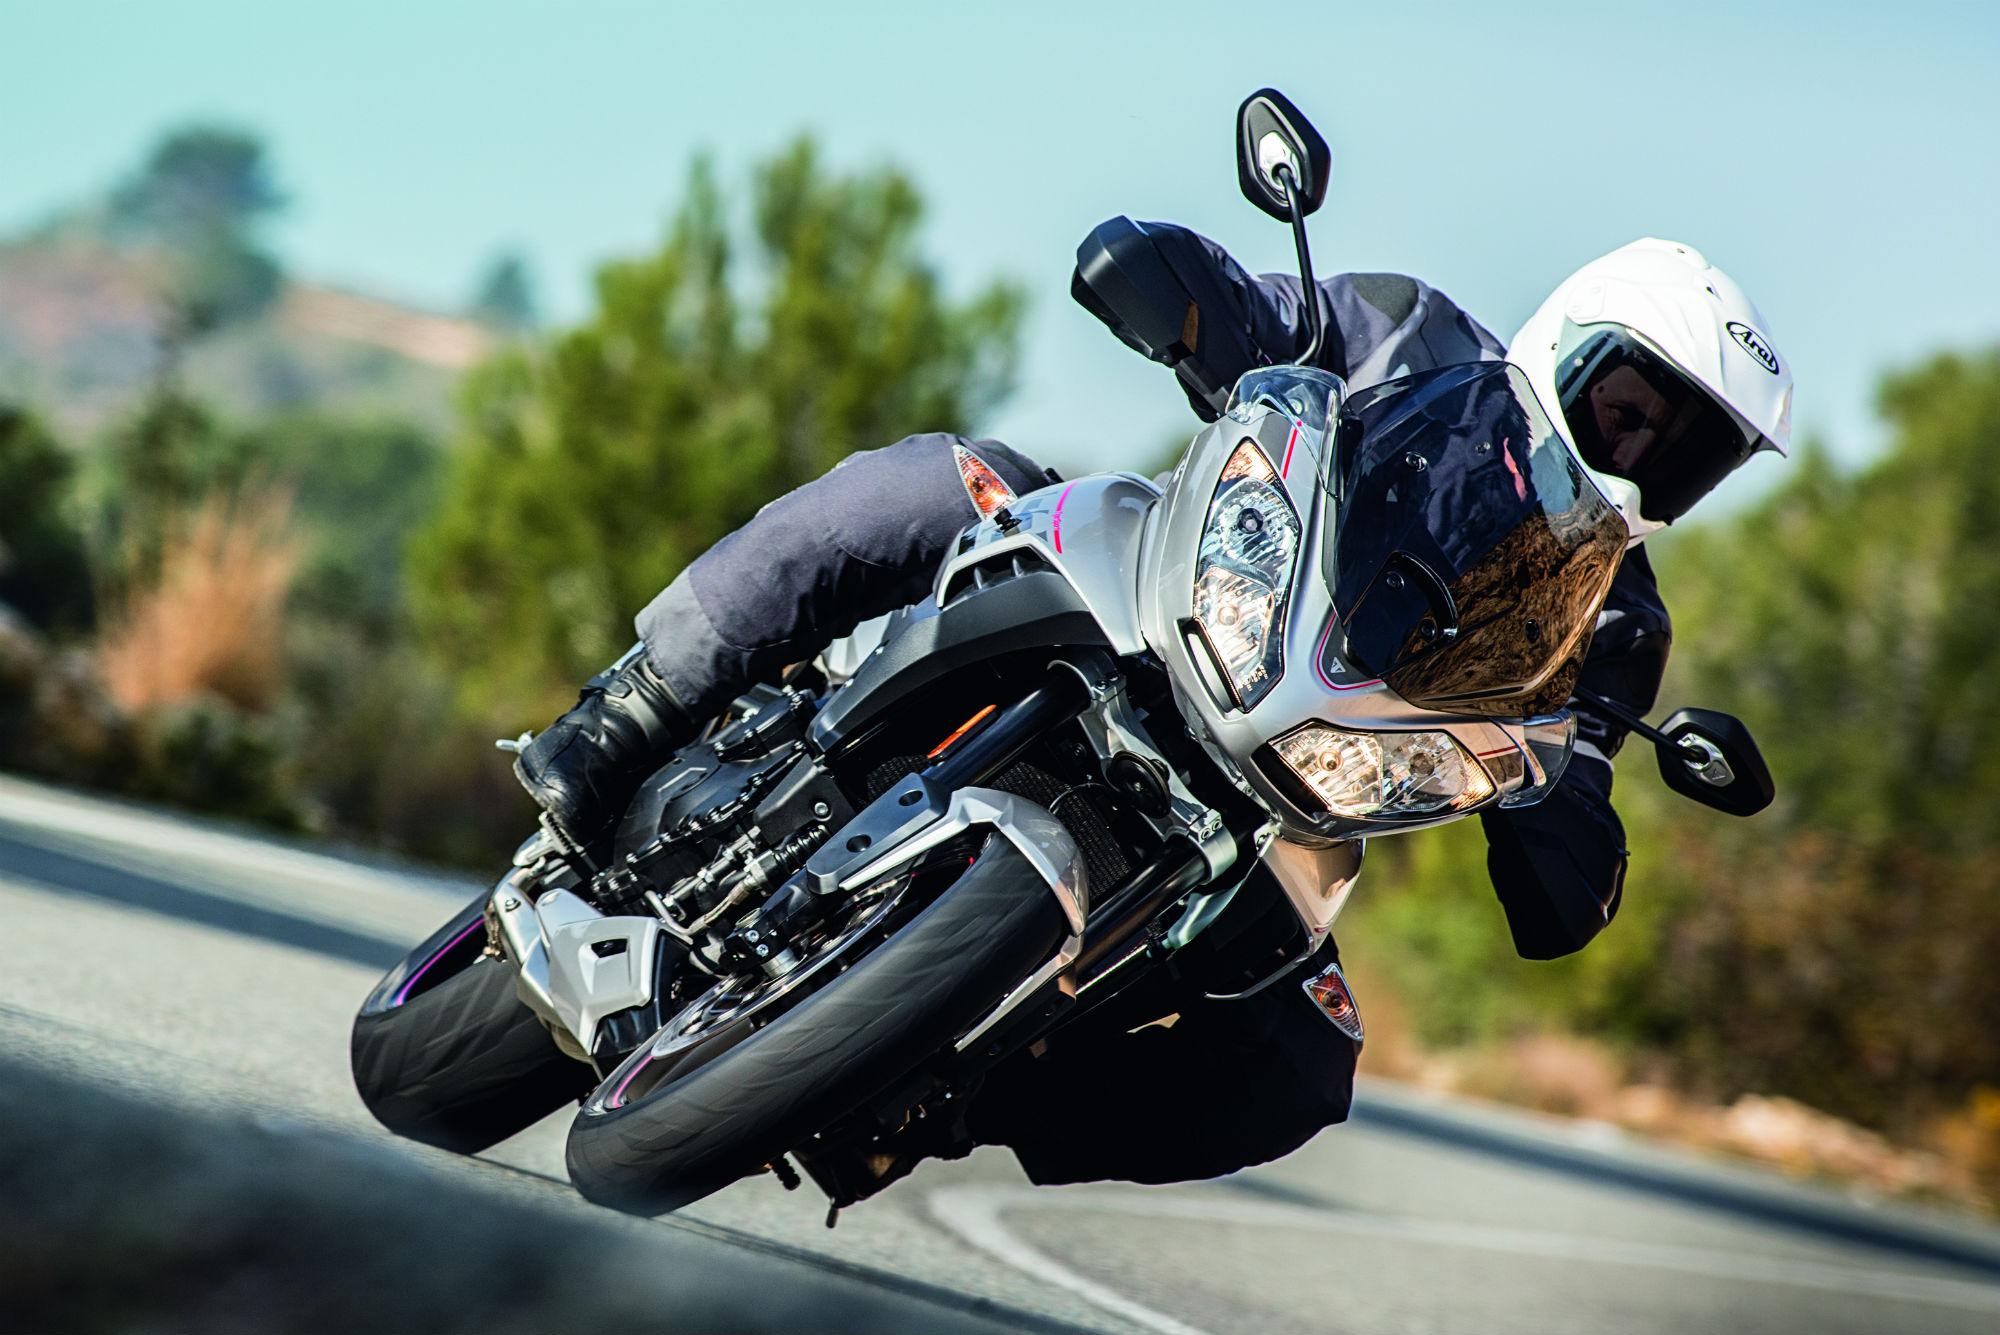 New Triumph Tiger Sport revealed